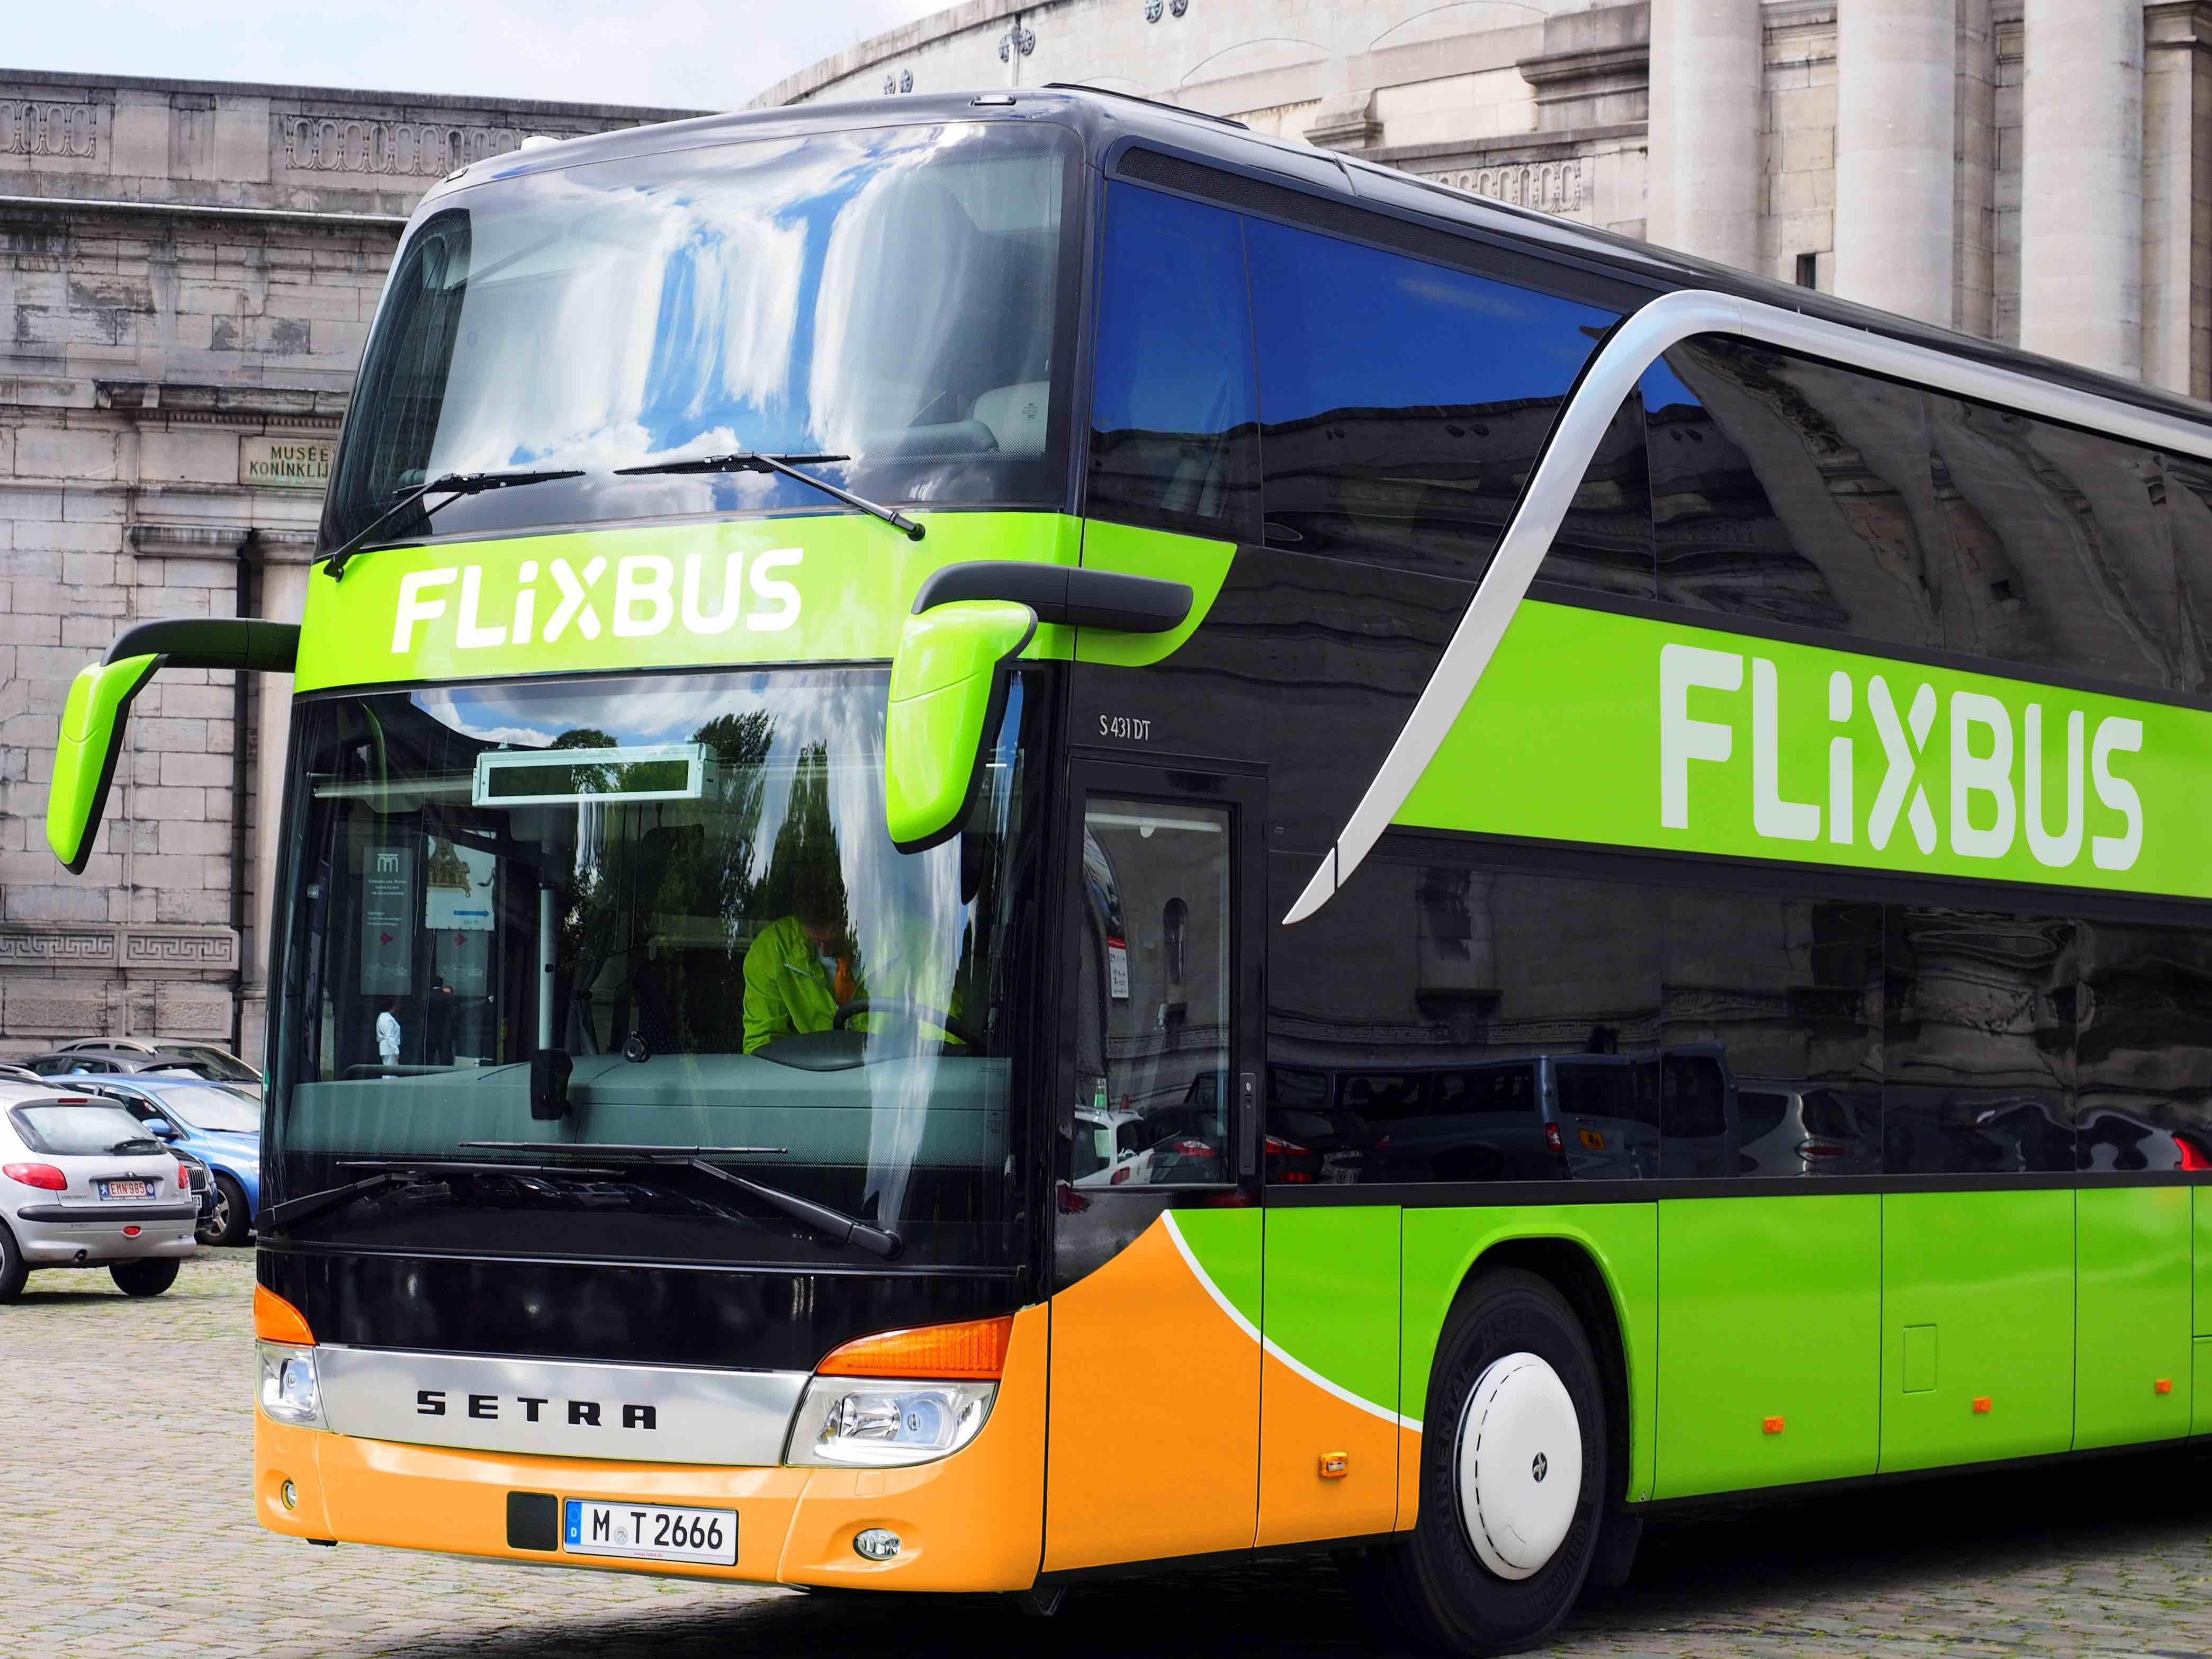 Un autobus Flixbus